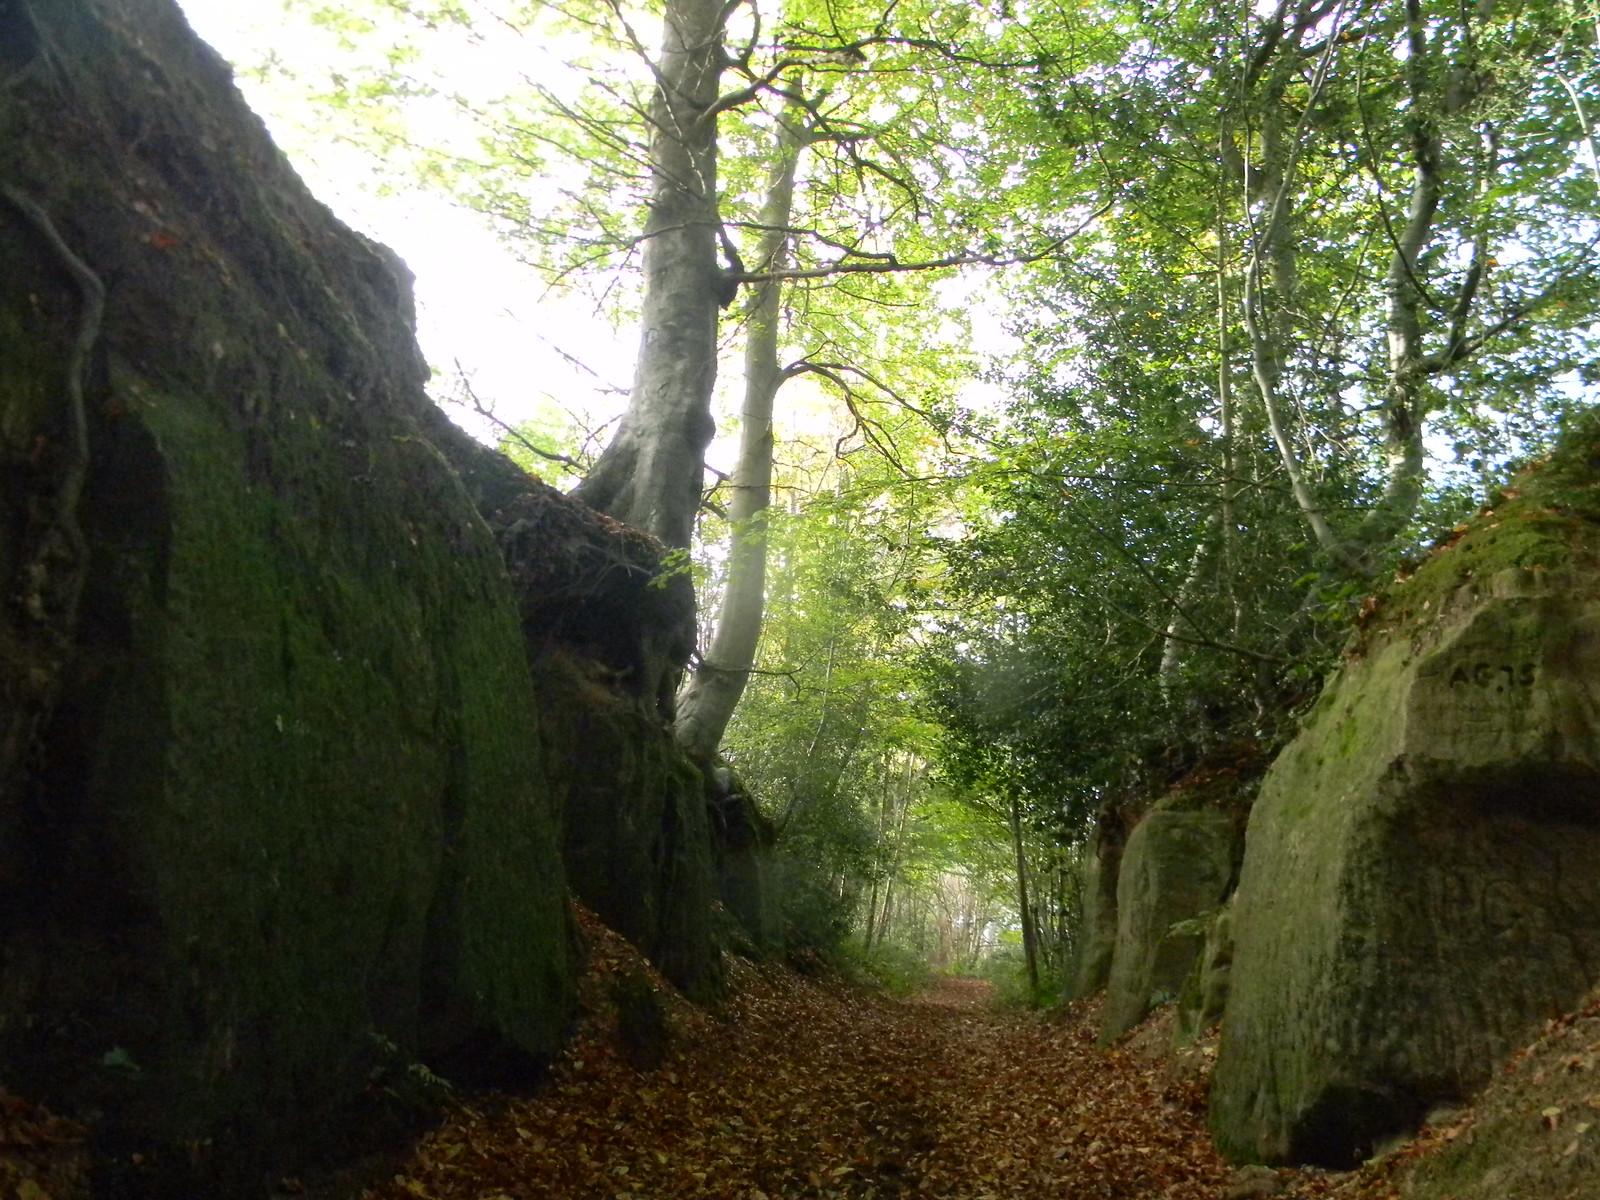 Through rocks Cowden to Hever